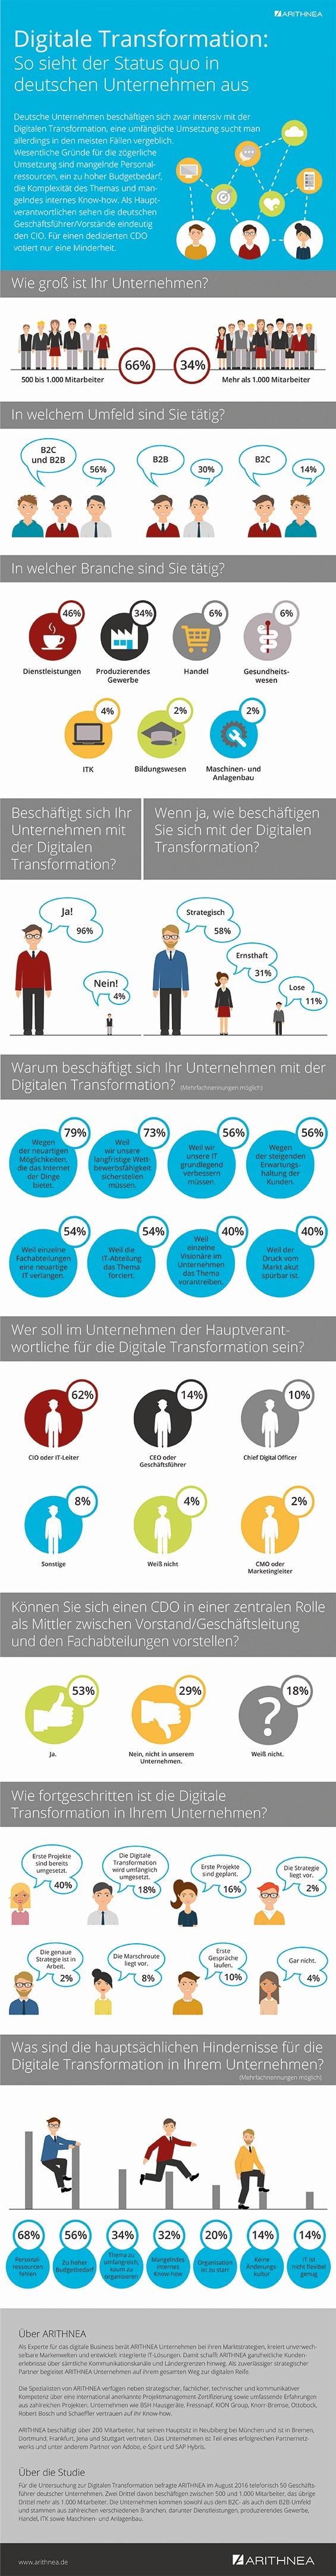 infografik-arithnea-digitale-transformation-status-quo-de